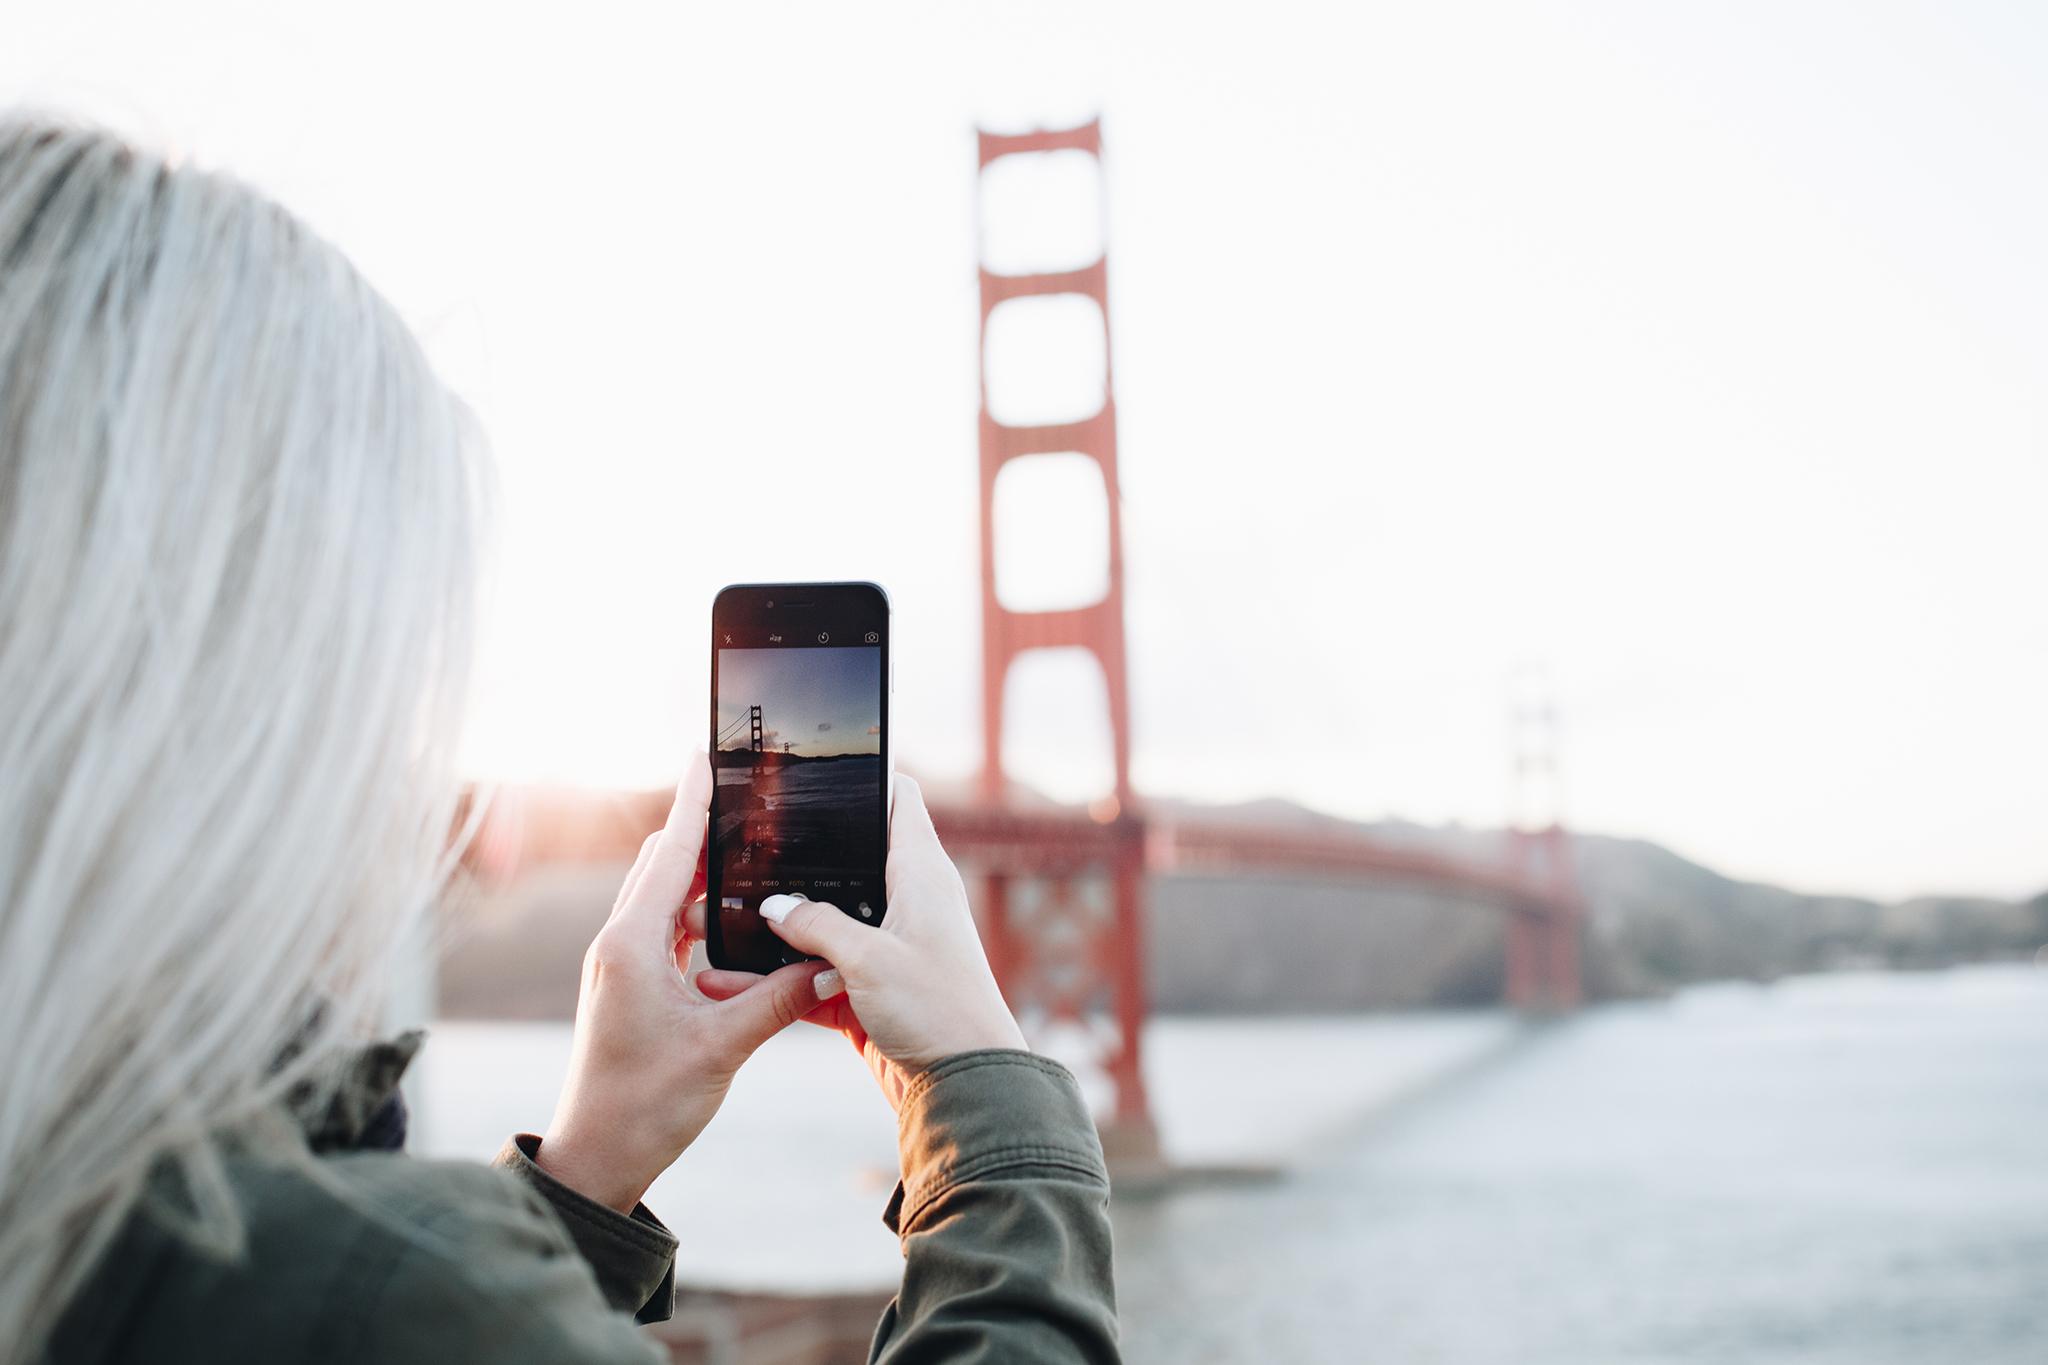 Jak budovat publikum na Instagramu?